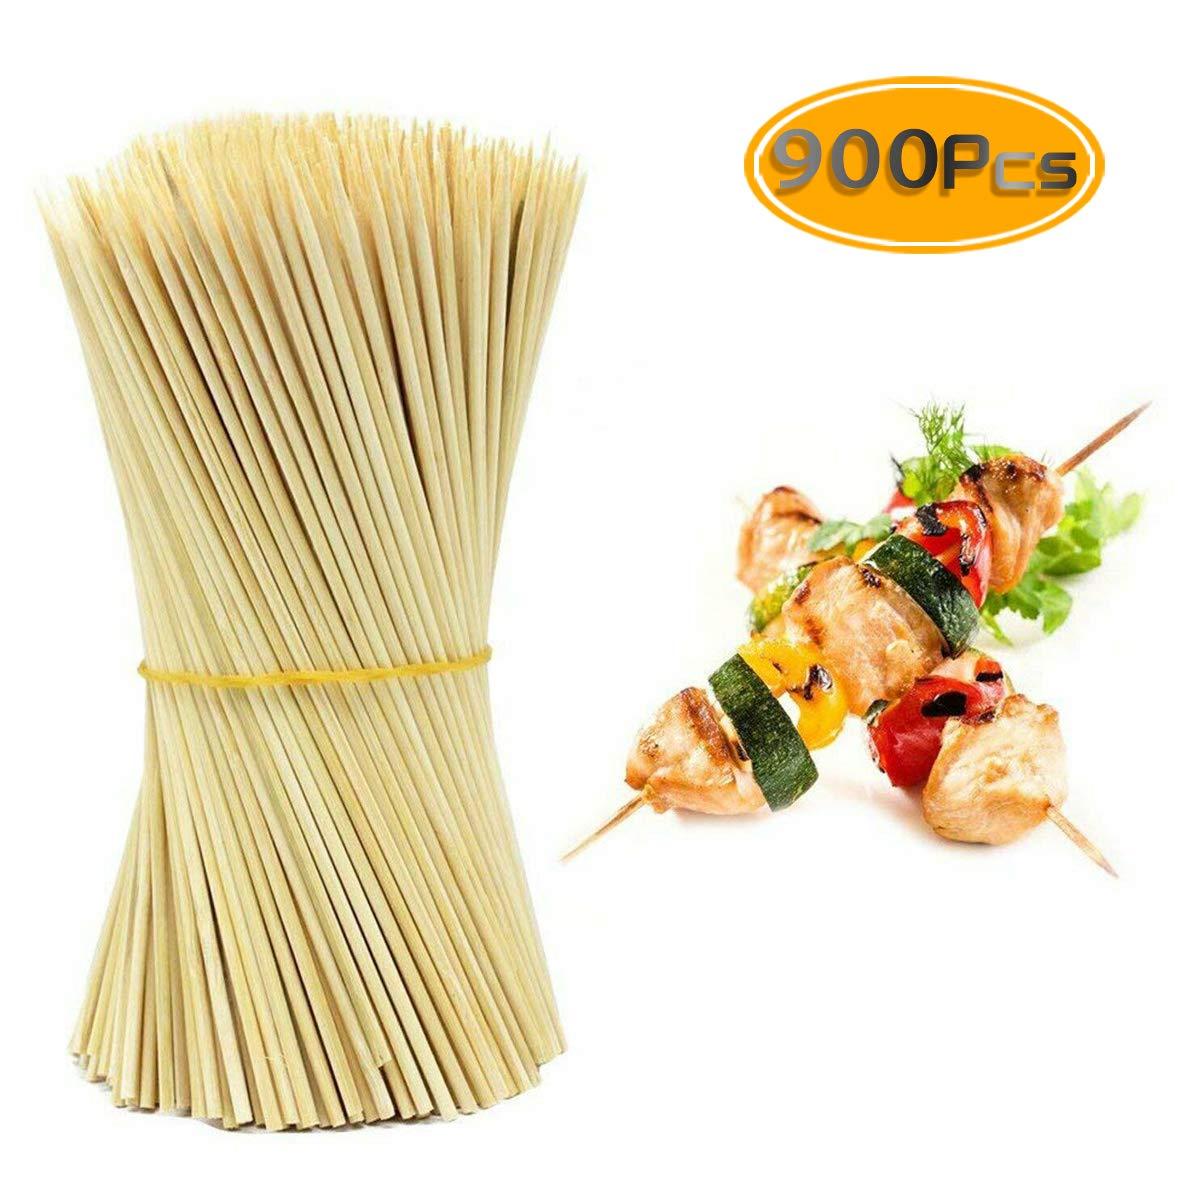 Amazoncom Bcpowr 900pcs Bamboo Sticks Wooden Sticks For Food